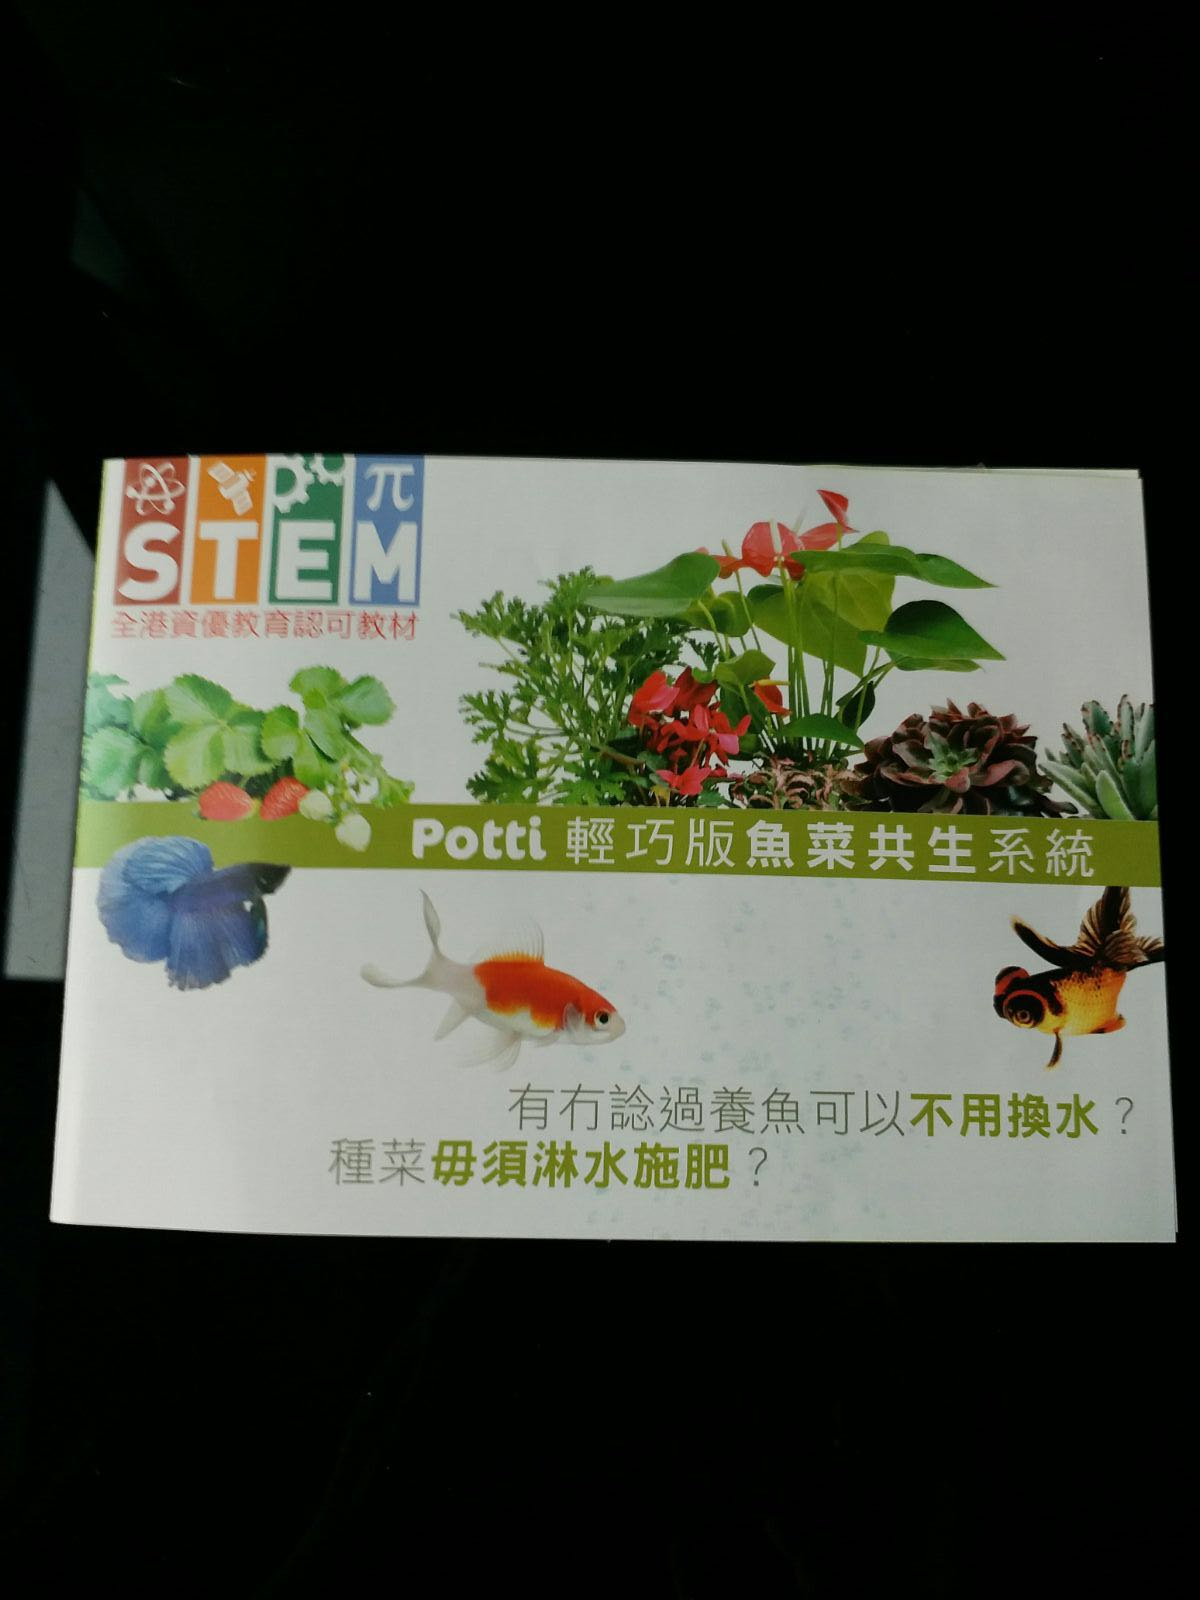 Superfarm魚菜共生系統 STEM 包保養